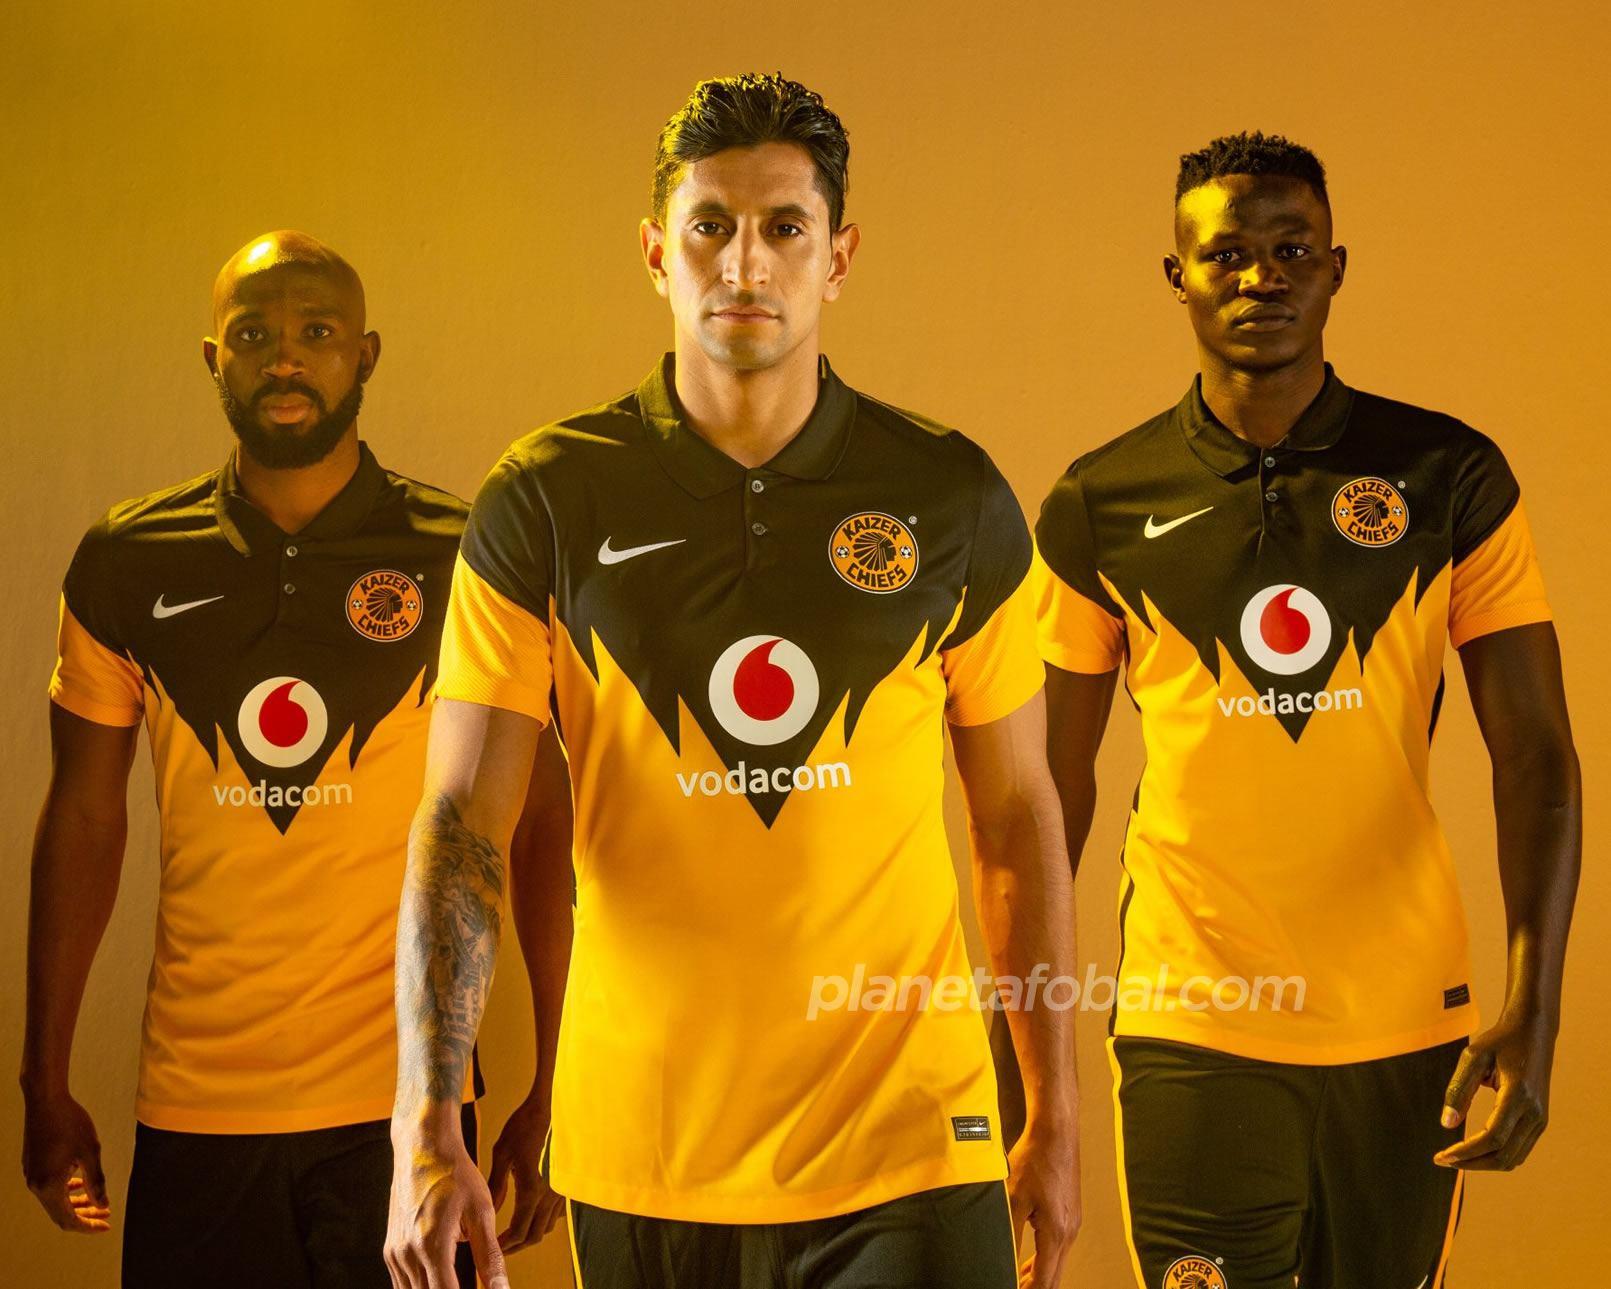 Camisetas Nike del Kaizer Chiefs 2020/21 | Imagen Web Oficial